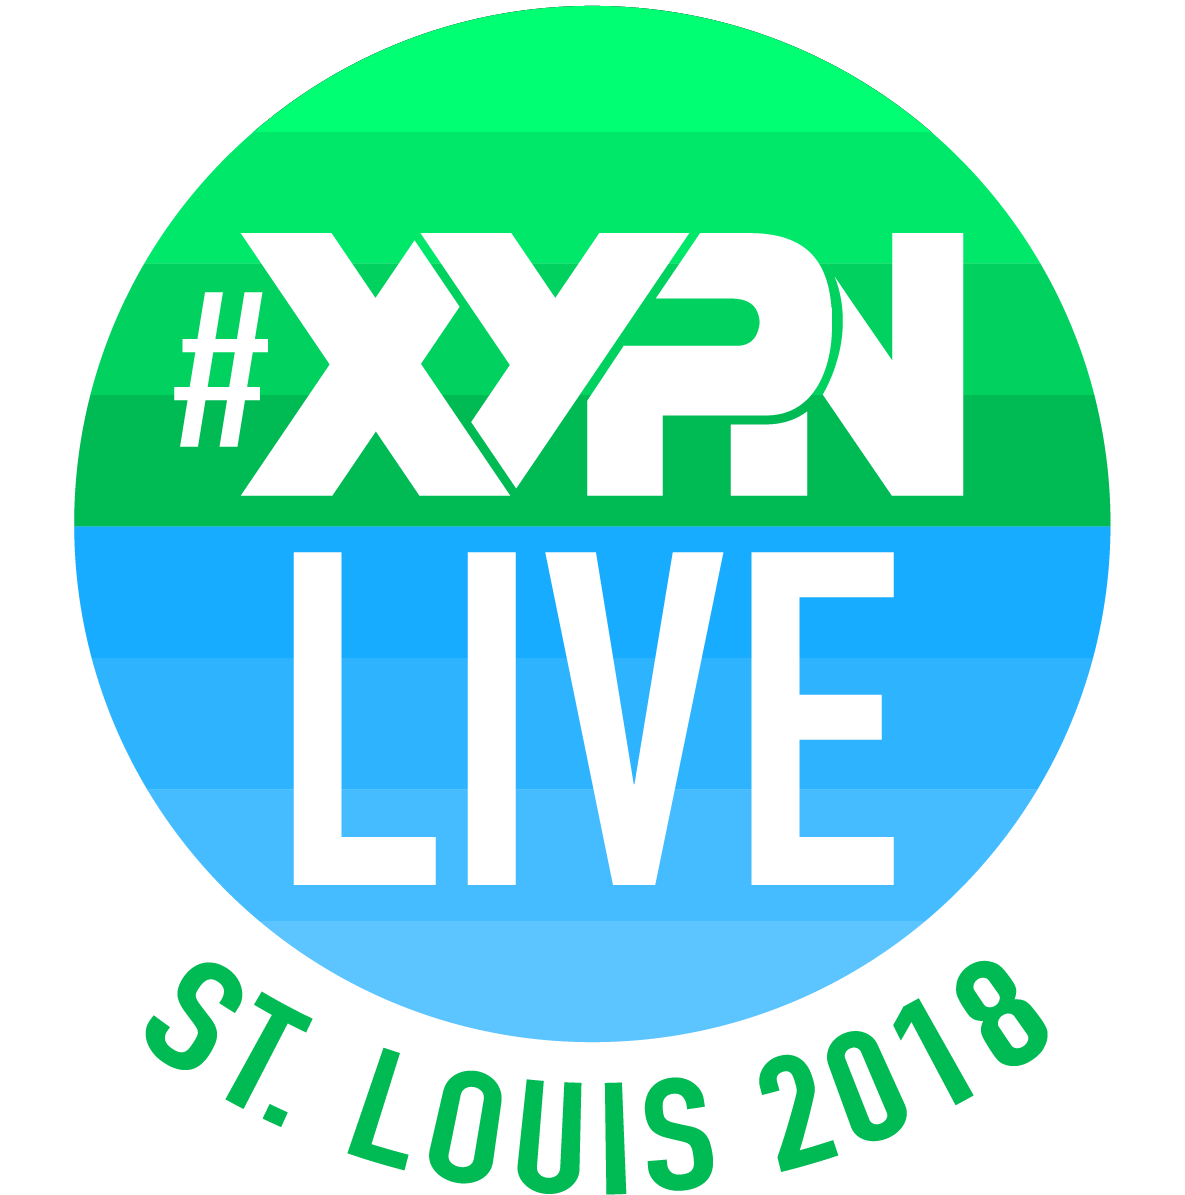 XYPN LIVE 2018